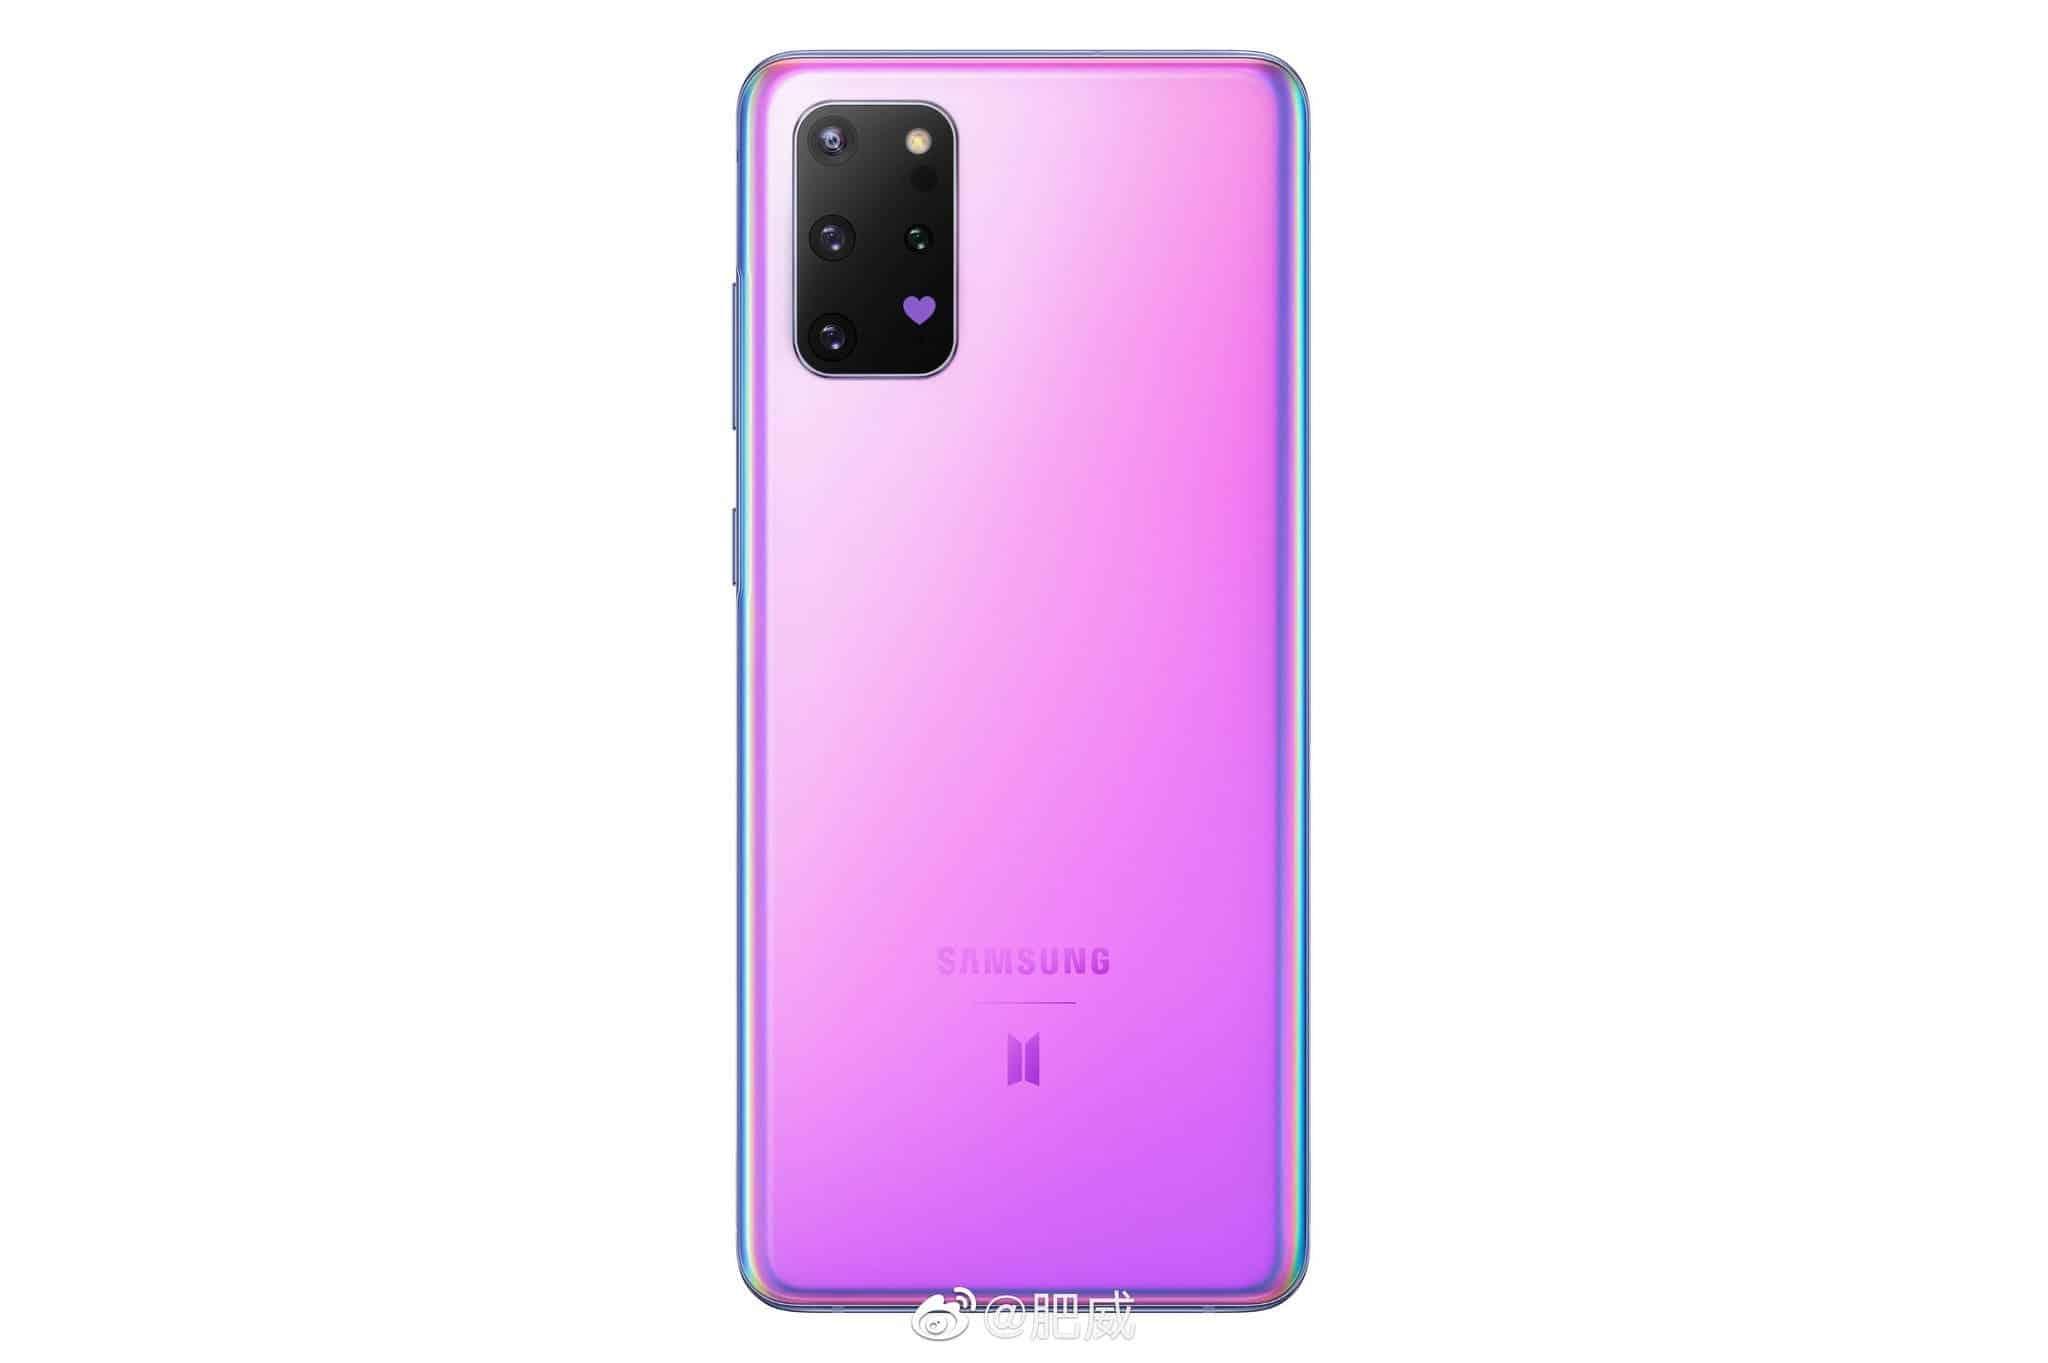 Samsung Galaxy S20 Bts Edition Launched Gizchina Com